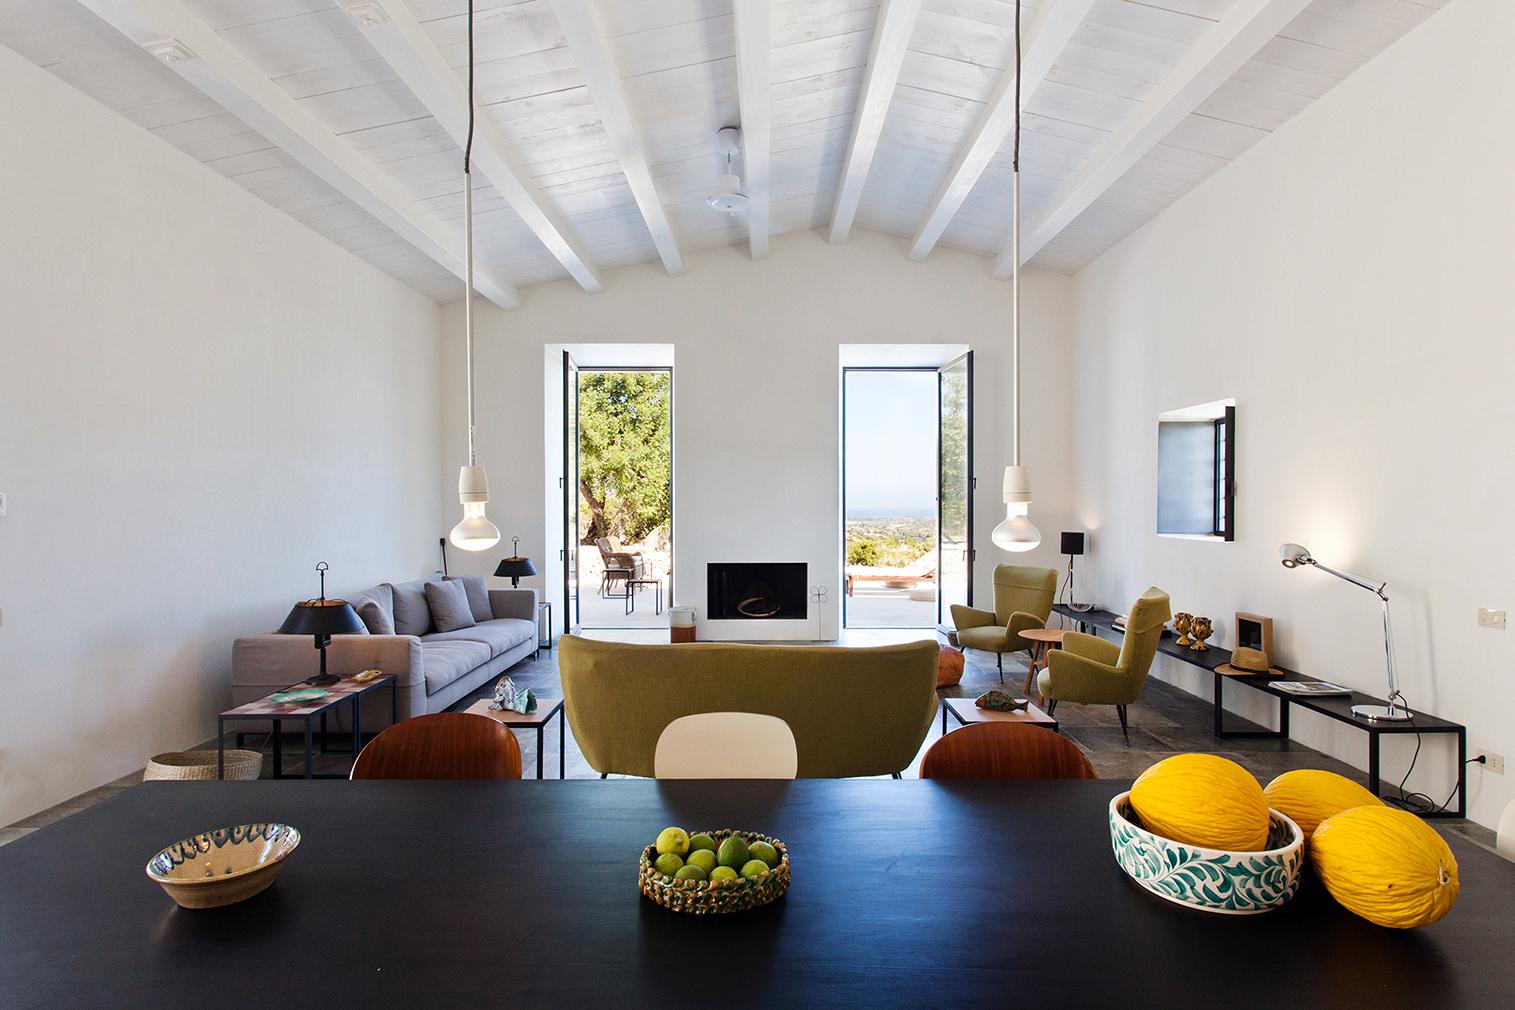 Villa Mura Mura for rent in Sicily via the Thinking Traveller